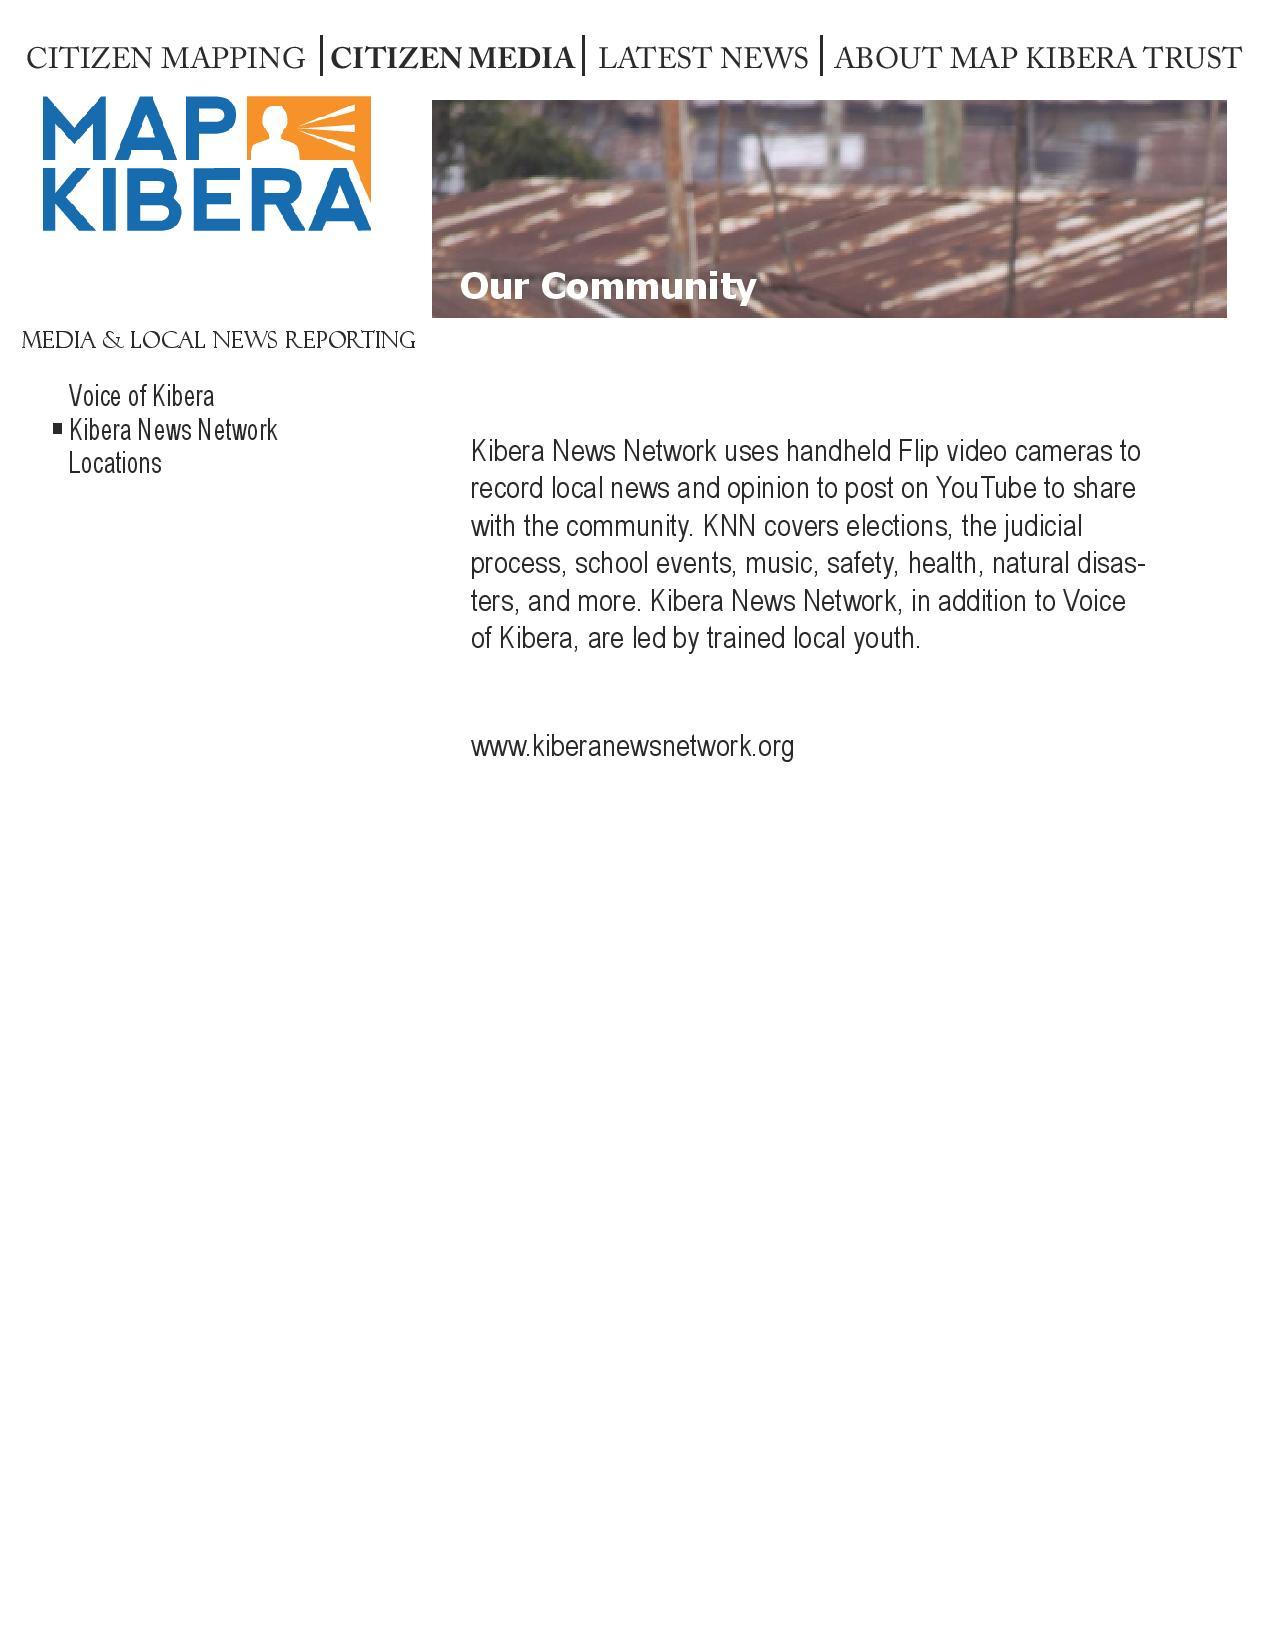 7_MK_citizen media page_2_v2-page-001.jpg